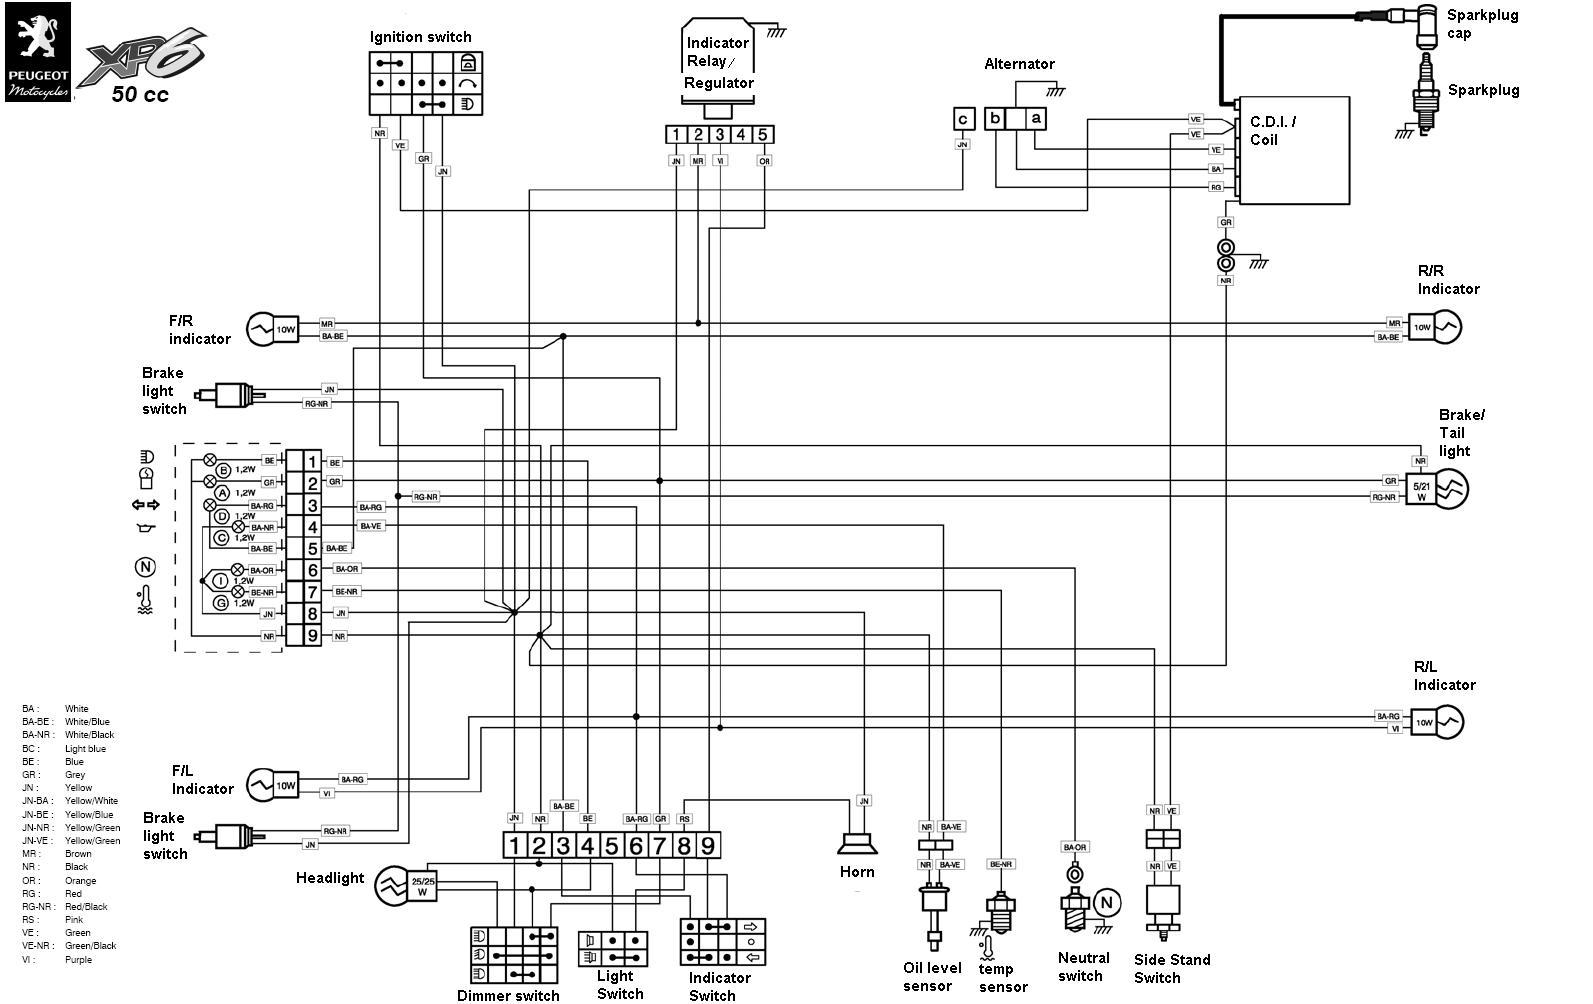 peugeot scooter ewd motorcycle manuals pdf basic electrical wiring diagrams automotive wiring diagrams [ 1593 x 1004 Pixel ]